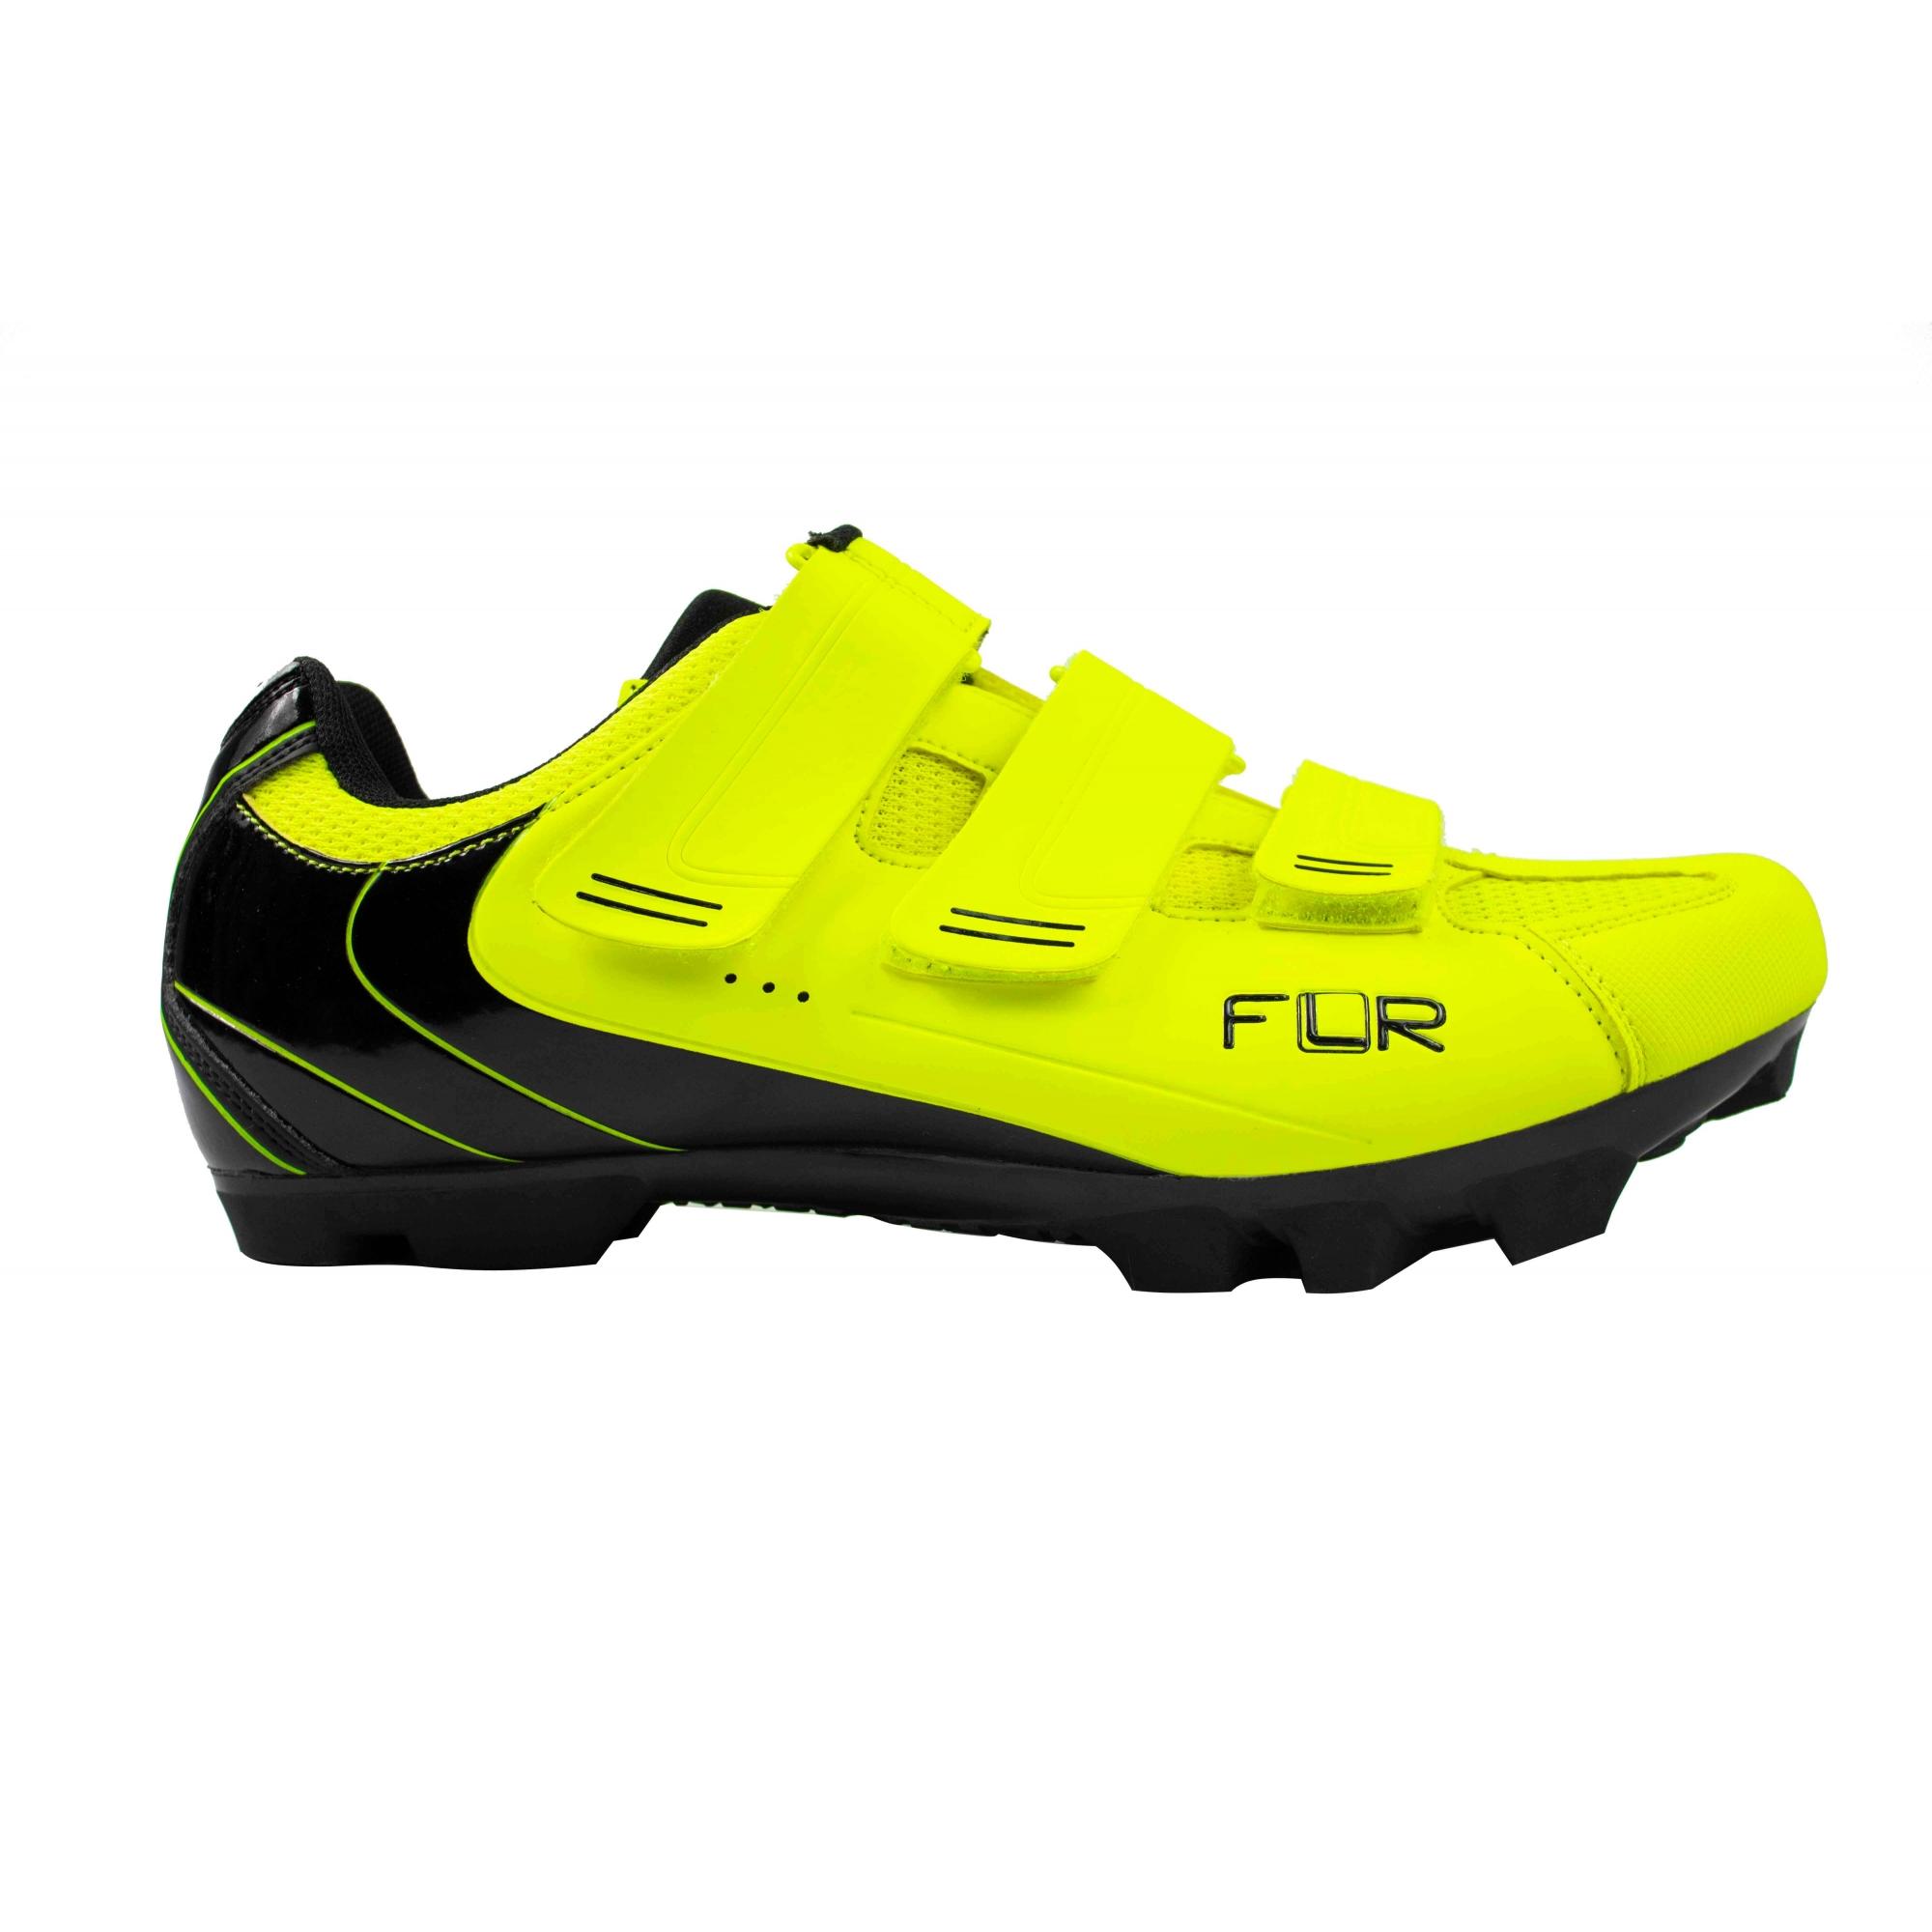 Sapatilha Ciclismo Mtb Flr F-55 Unissex Amarelo Flúor